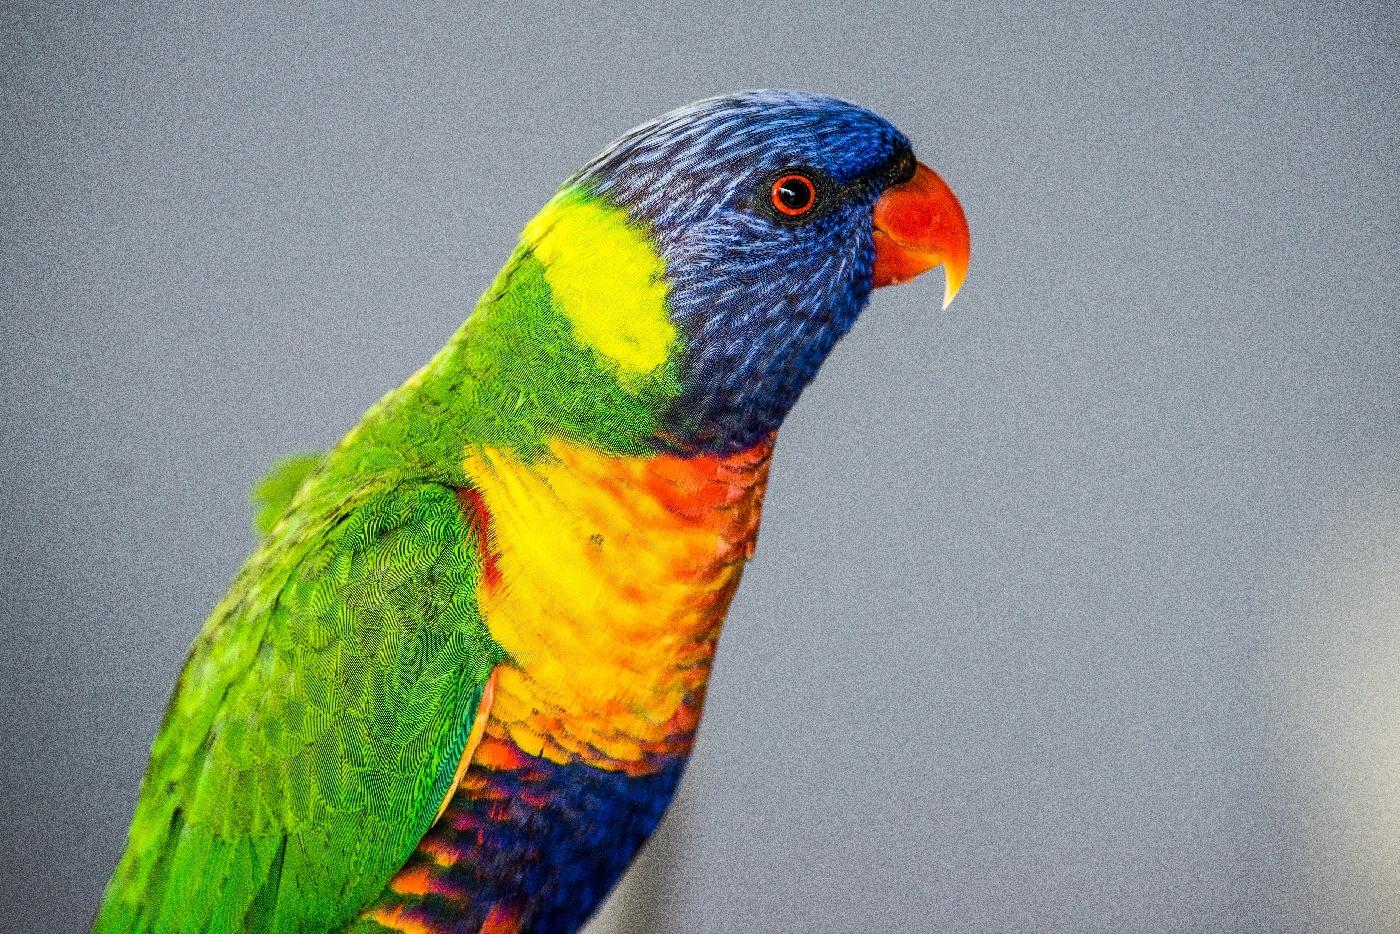 Rainbow Lorikeet by chrisgnixon